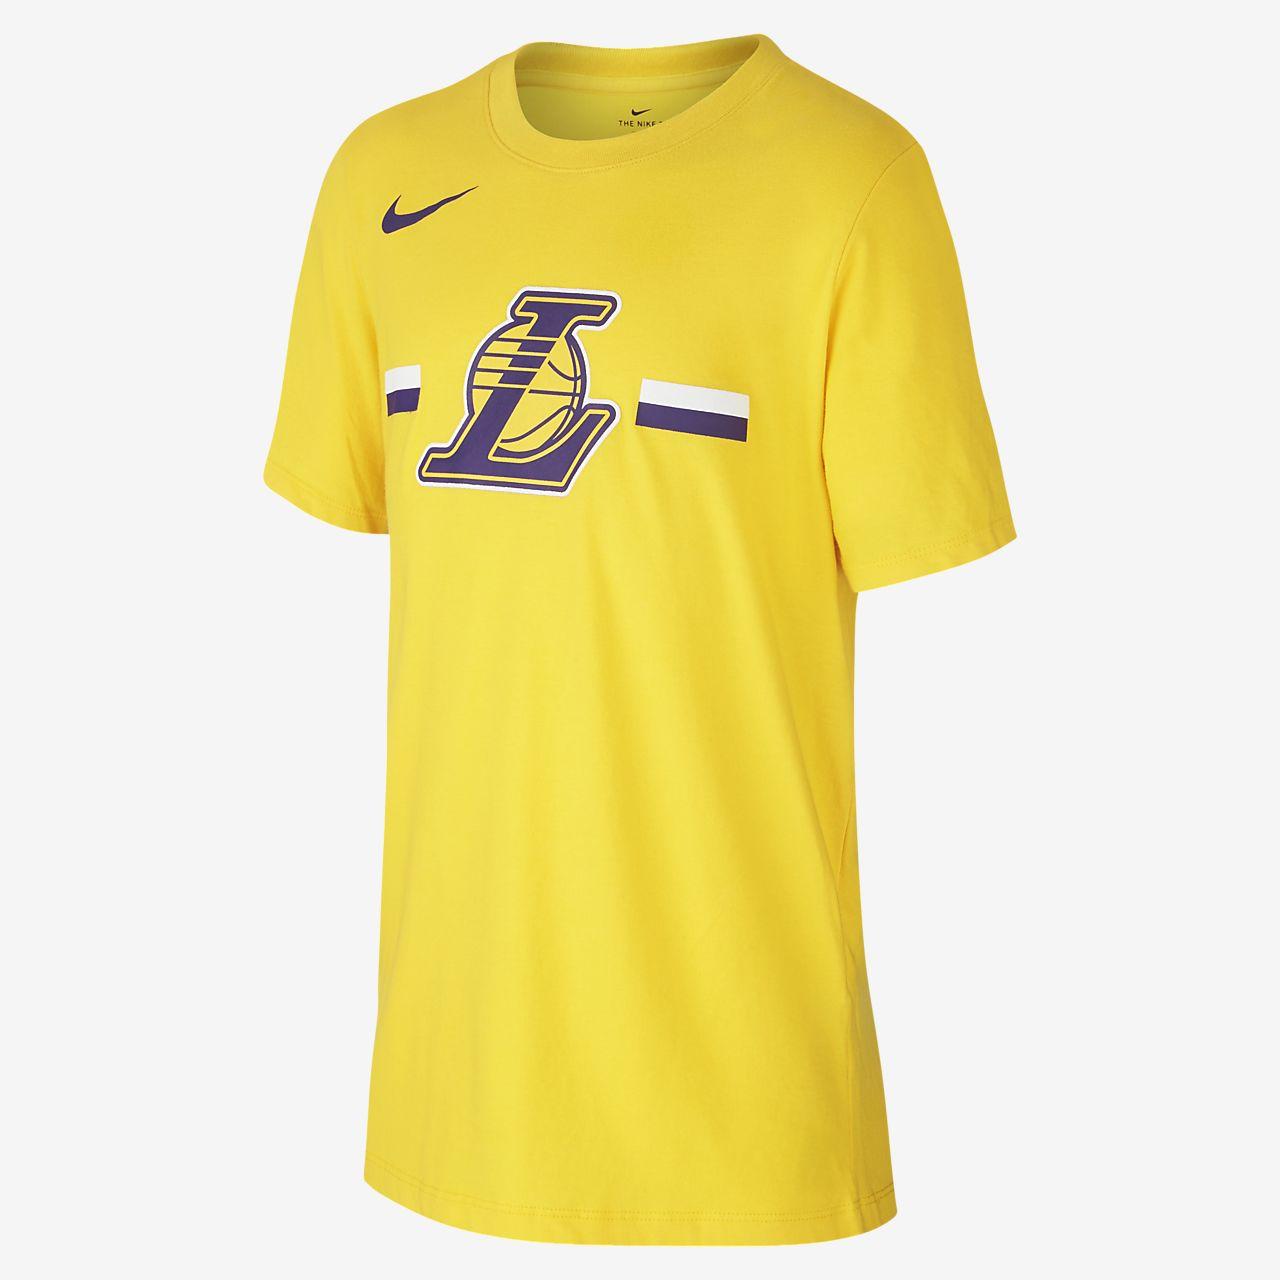 Los Angeles Lakers Nike Dri-FIT Logo Camiseta de la NBA - Niño/a